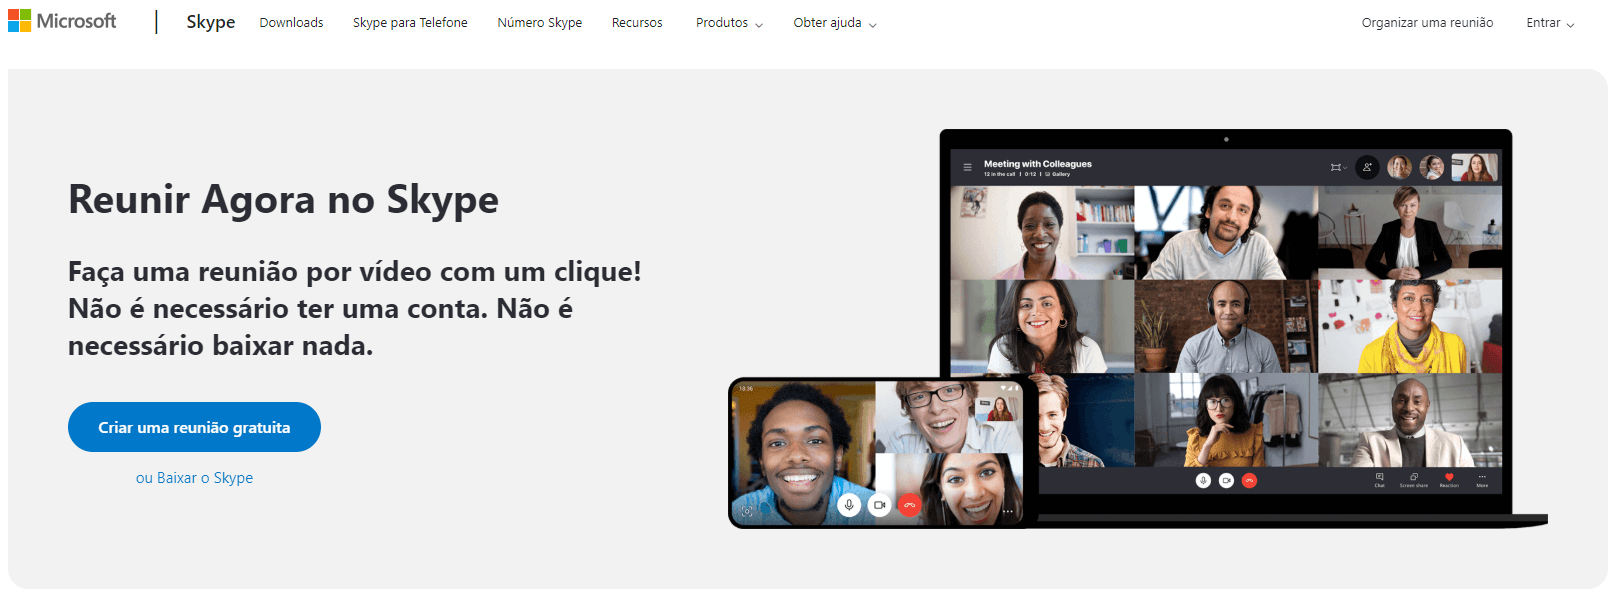 Skype: app para chamada de vídeo online